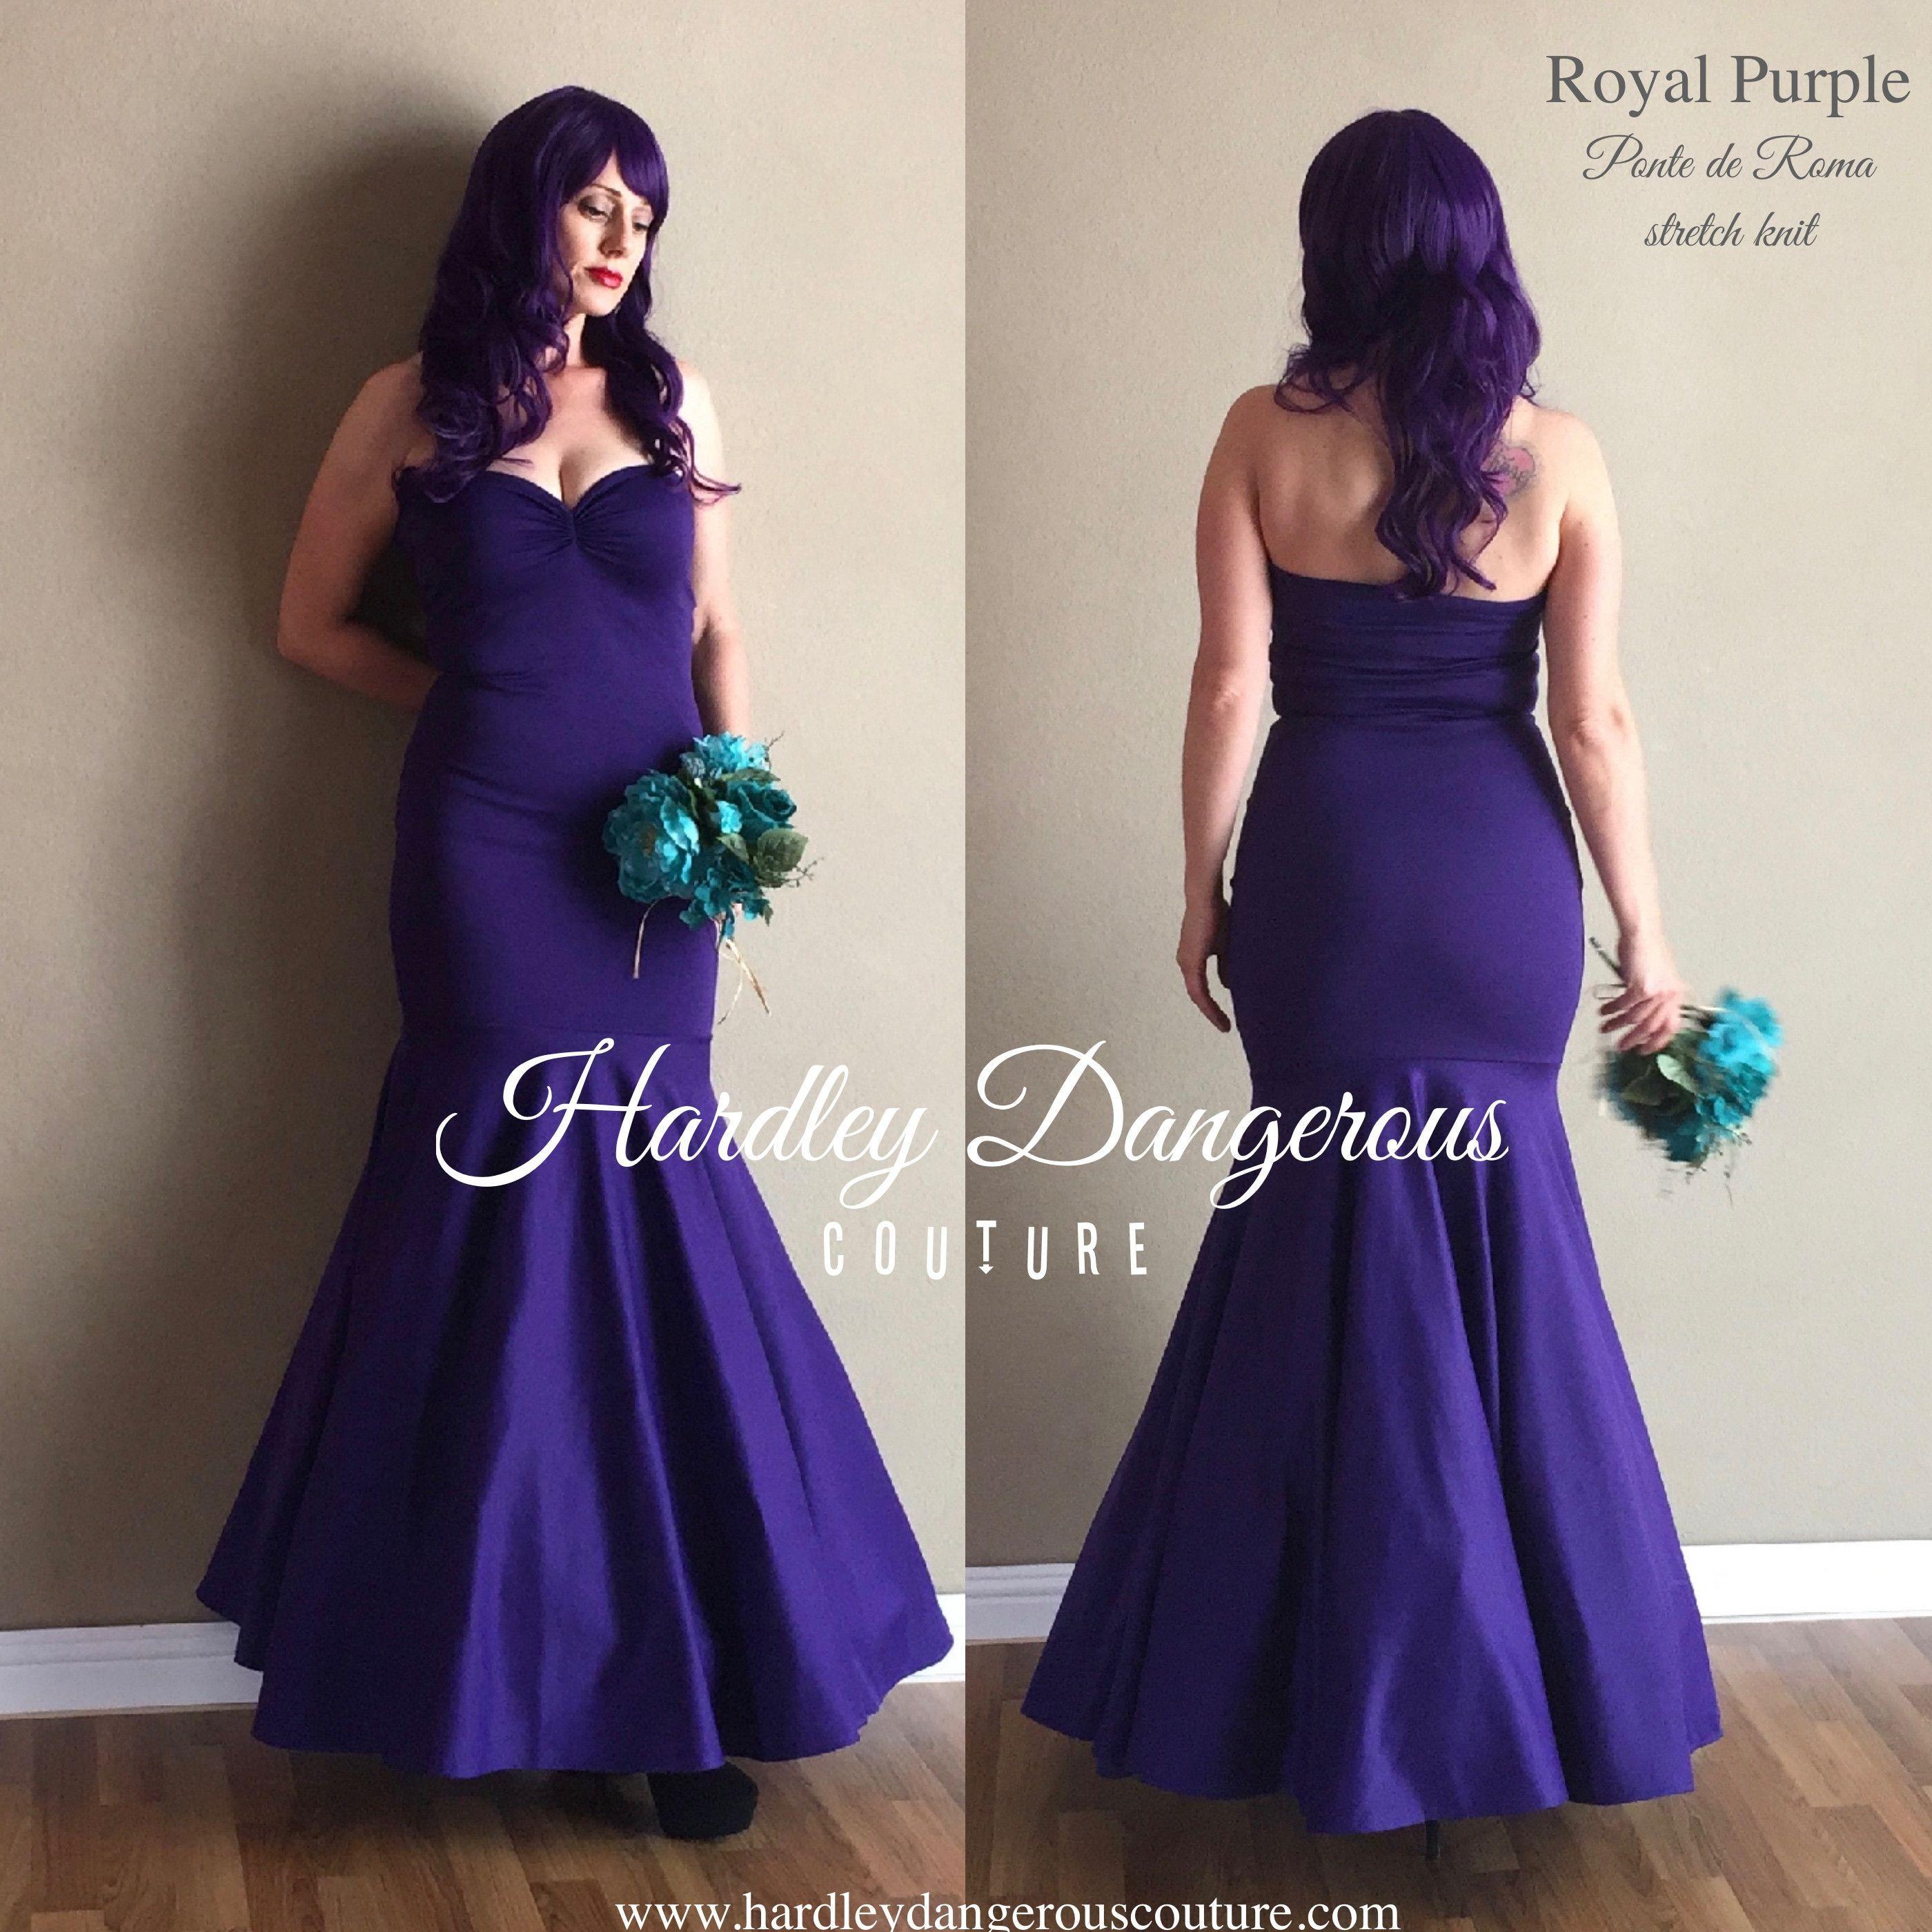 1950s inspired royal purple cherrybomb mermaid dress vintage vintage bridesmaid dresses 1950s inspired royal purple cherrybomb mermaid dress ombrellifo Images